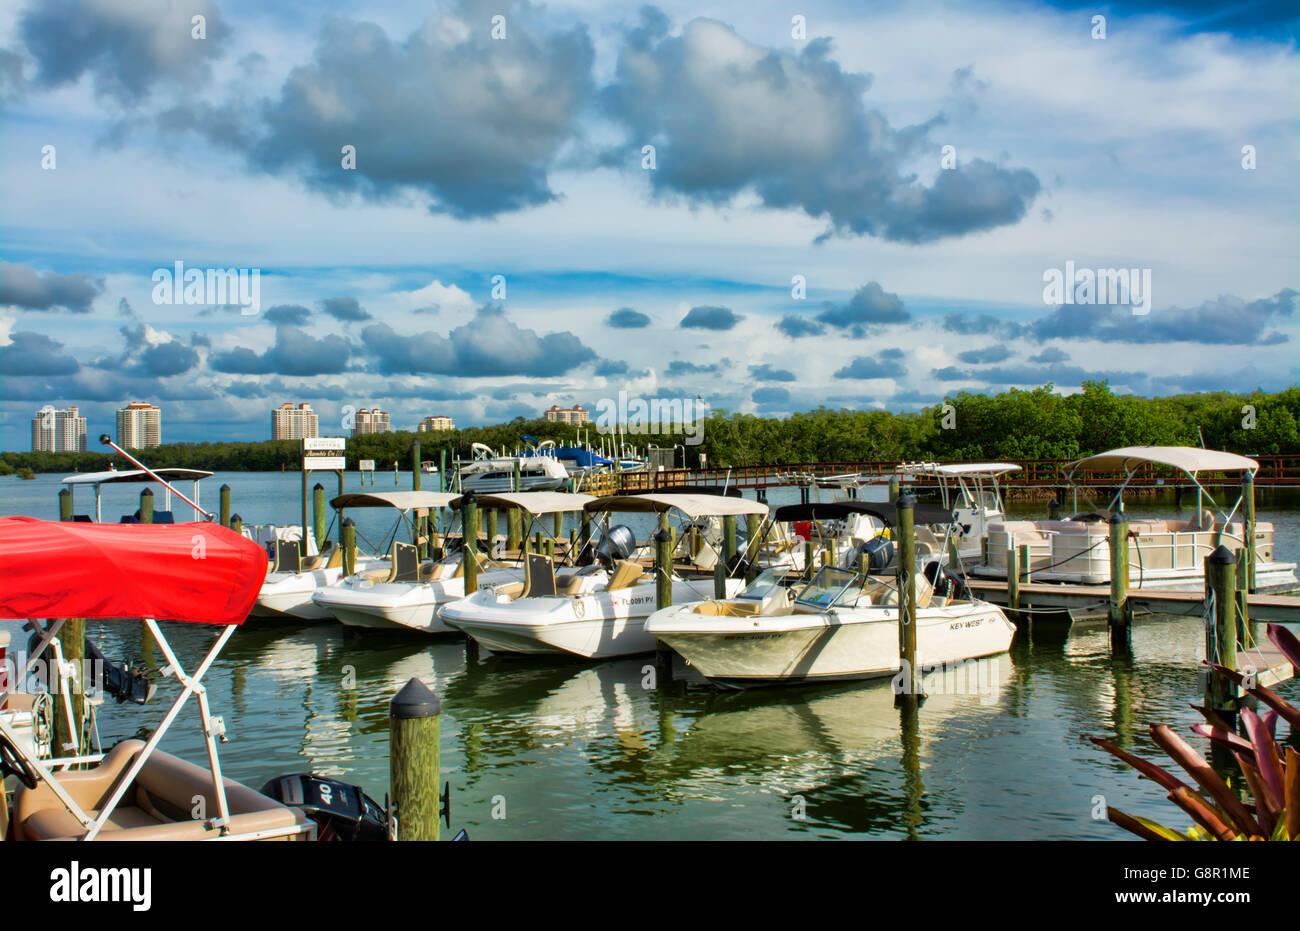 Bonita Springs Florida Big Hickory Marina with boats on intercoastal waters in bay relax restaurant - Stock Image